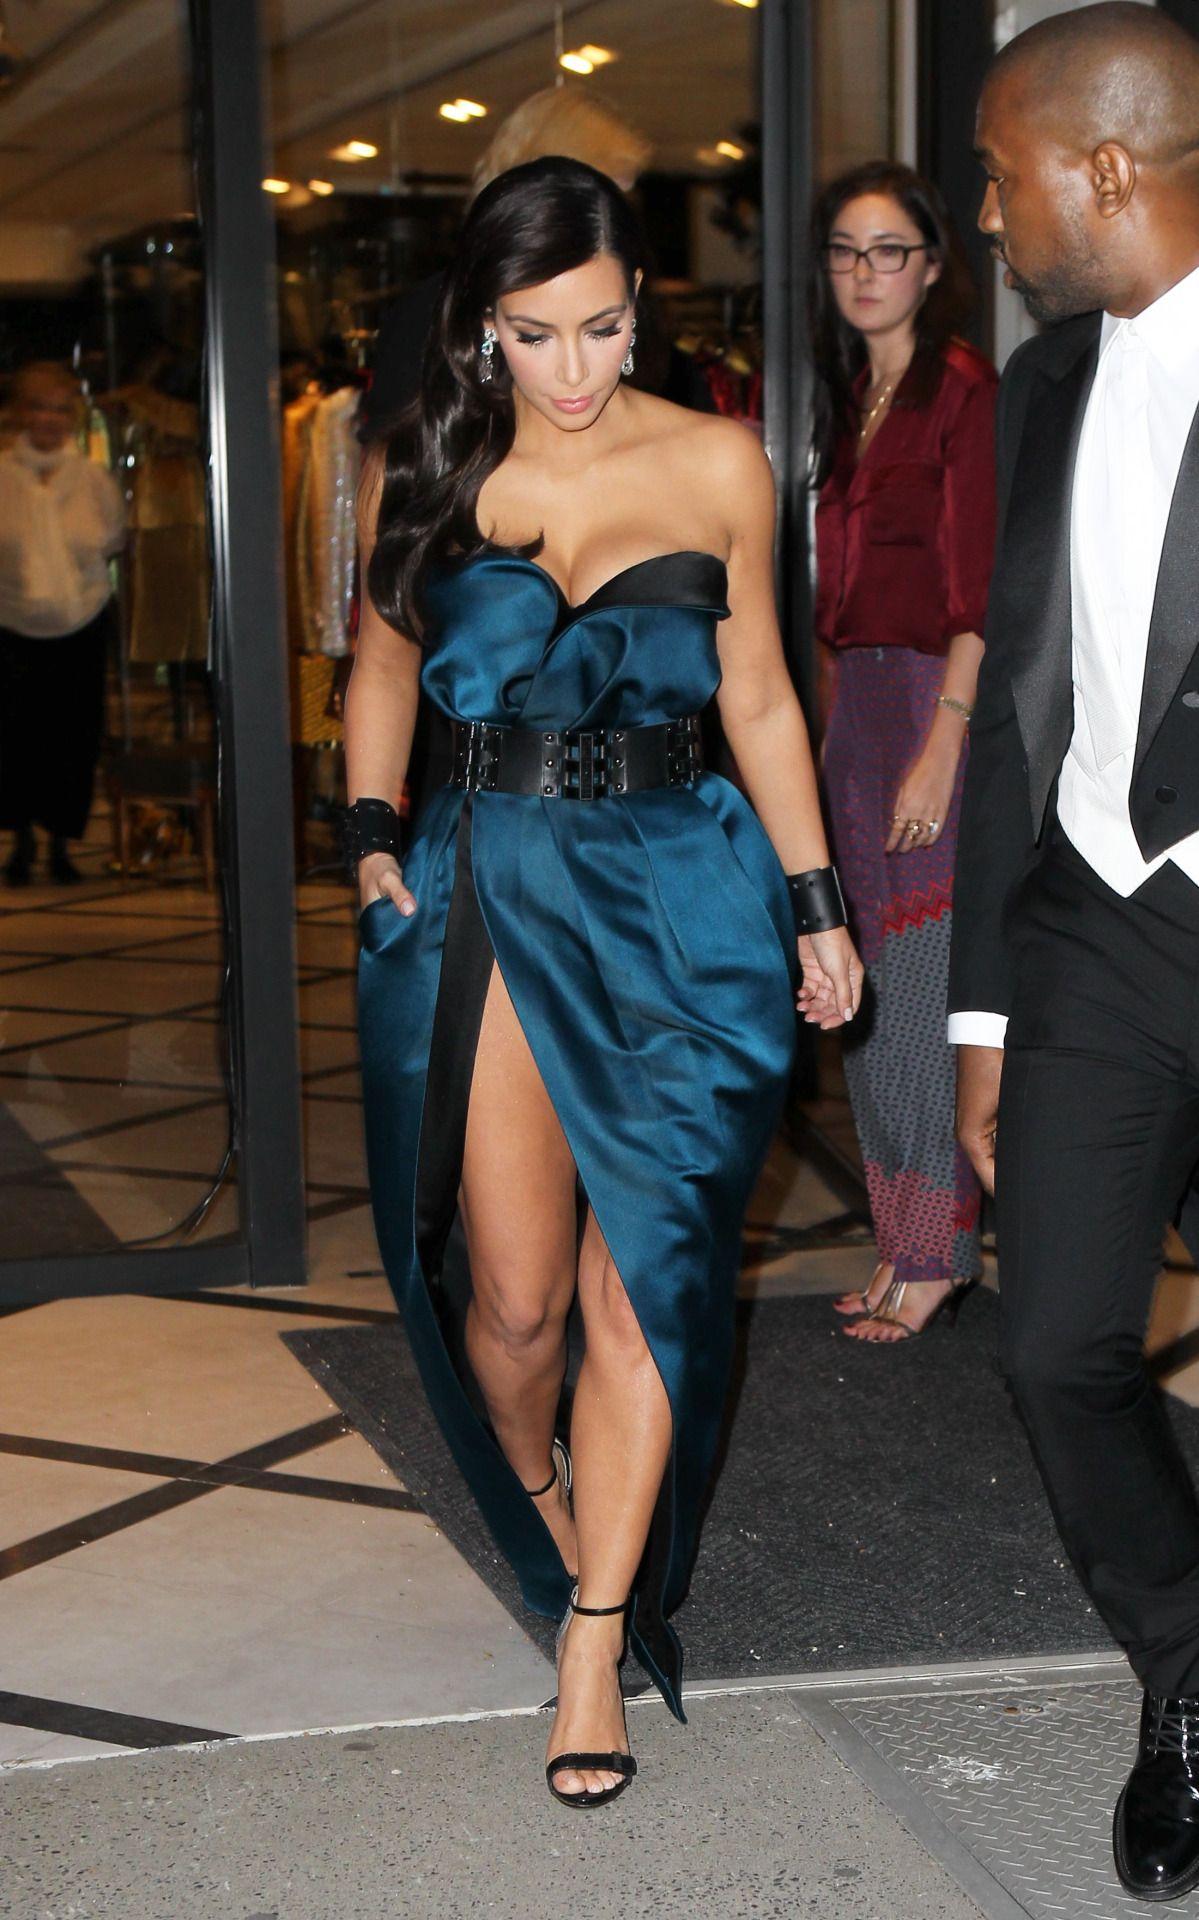 Kim Kardashian Strapless Dress | Kardashian style, Kim